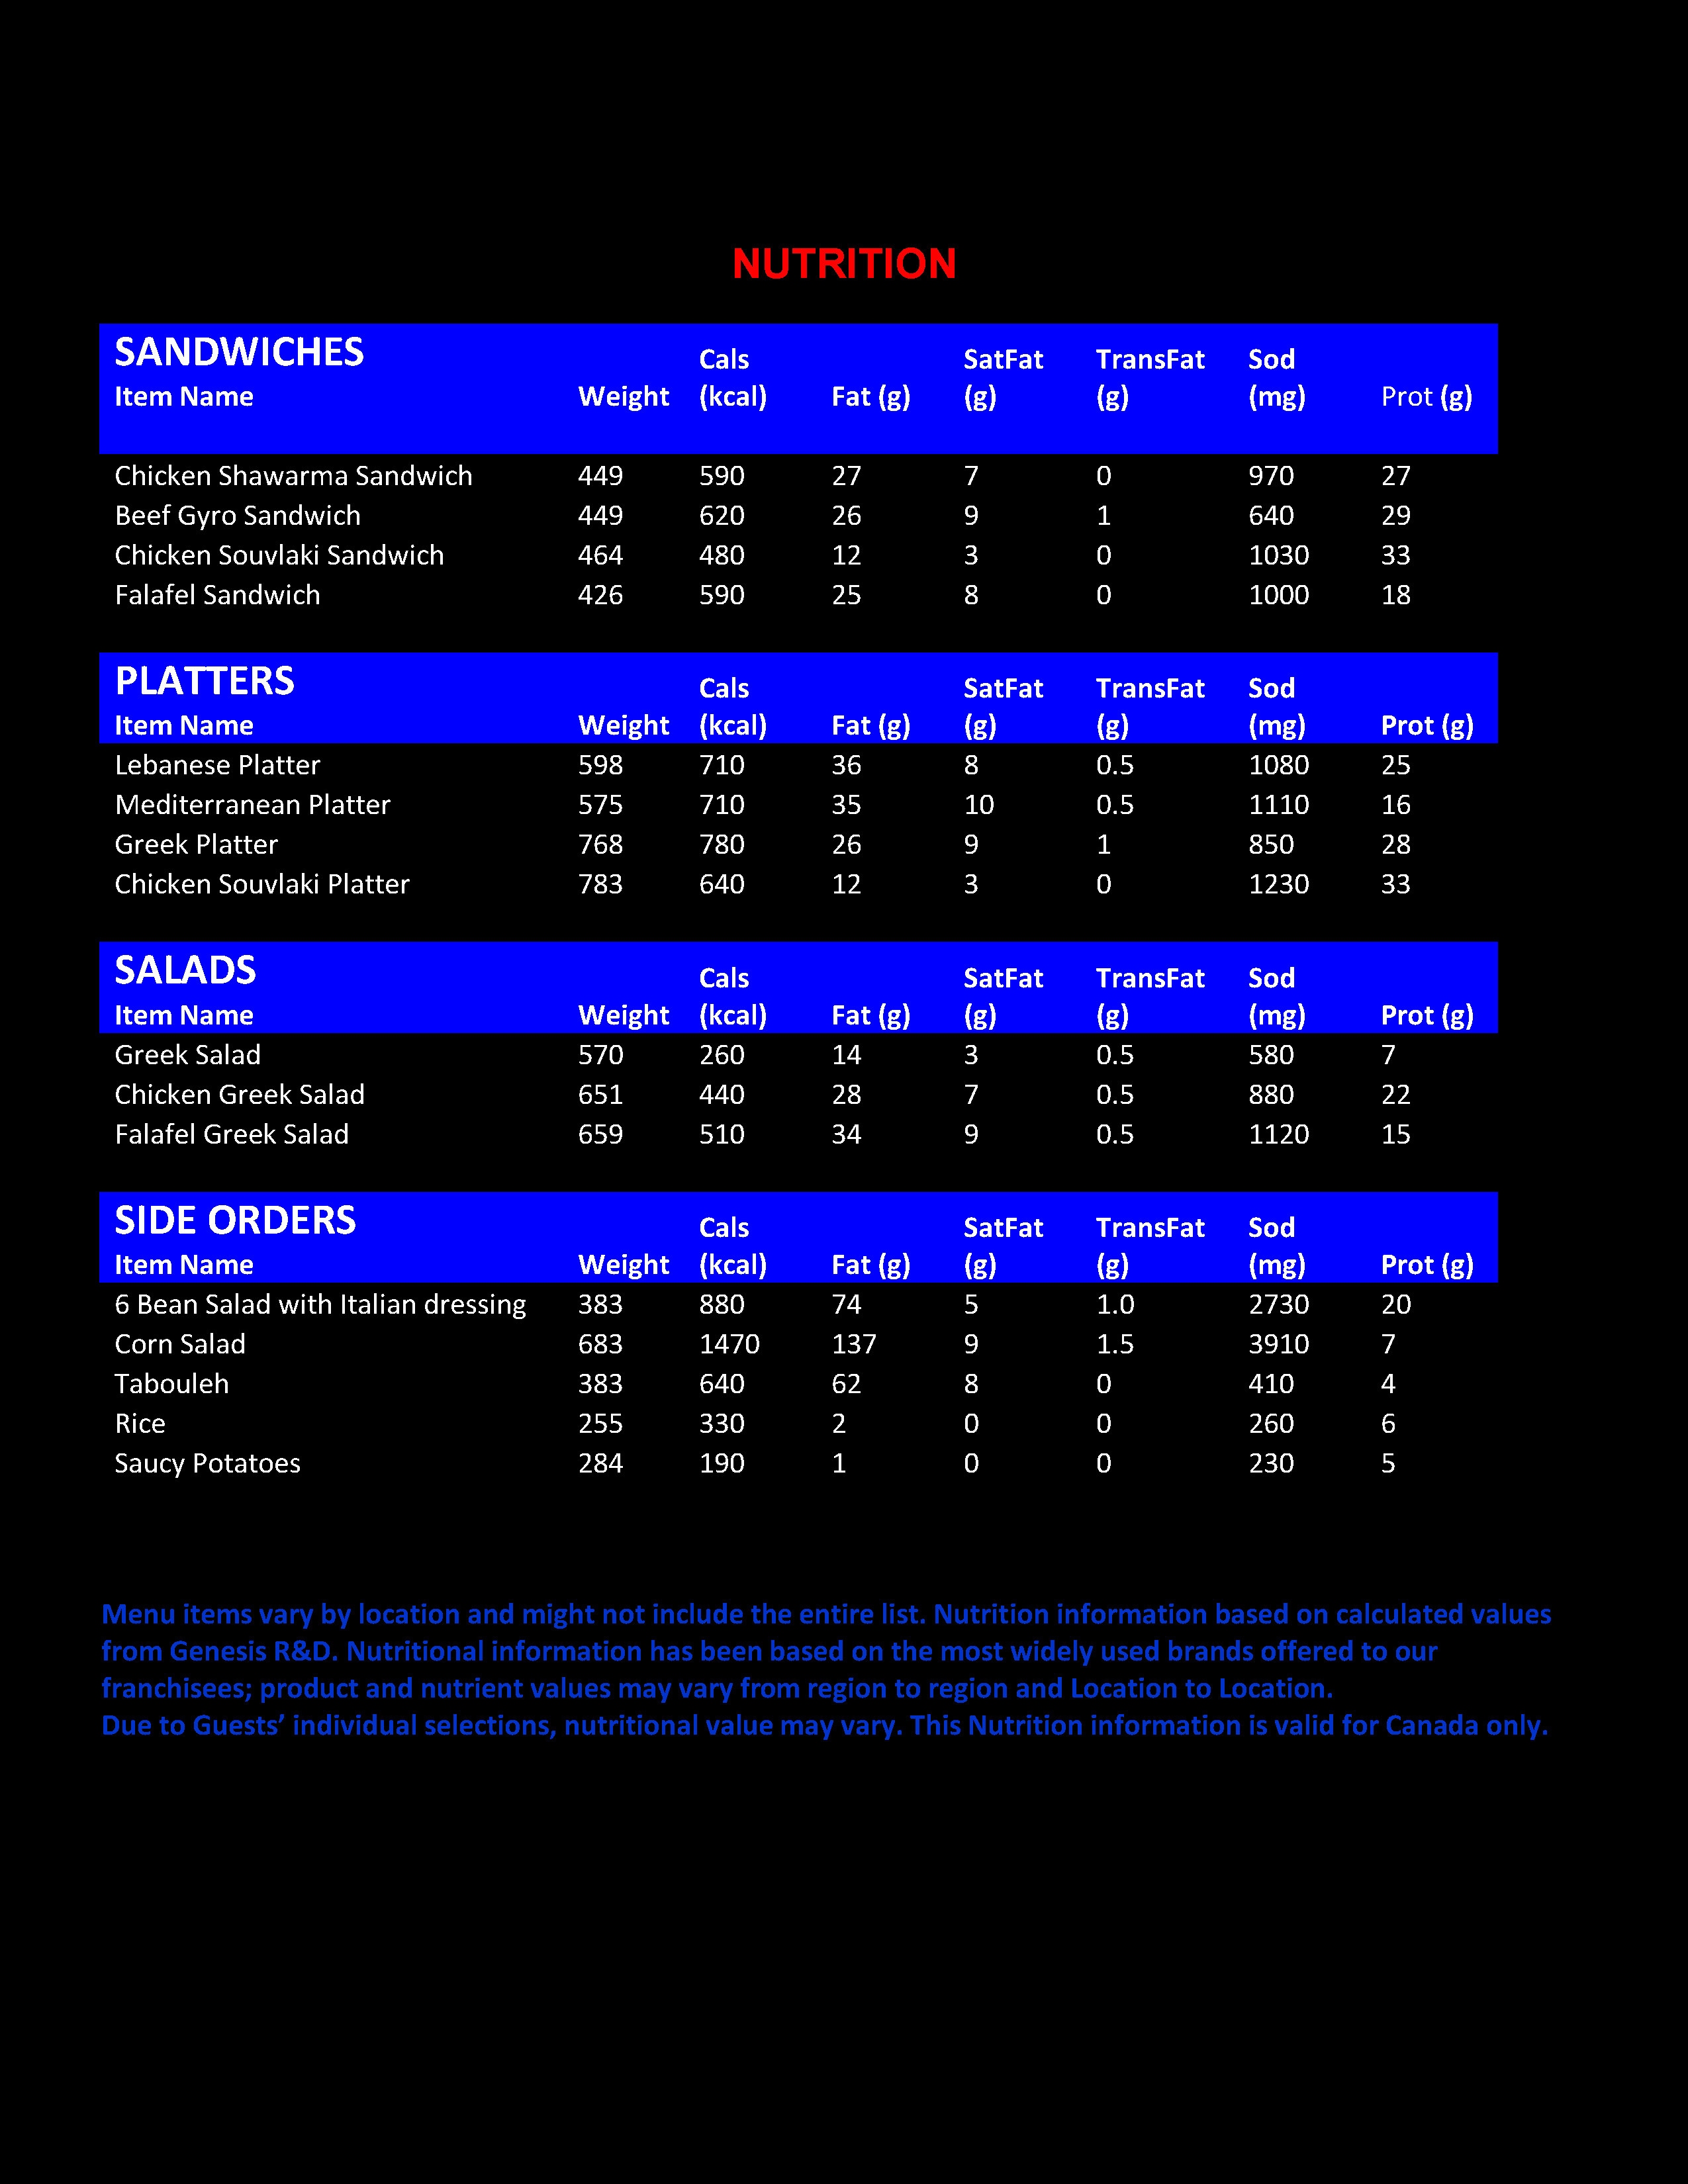 TOM-Nutrition-Info-2